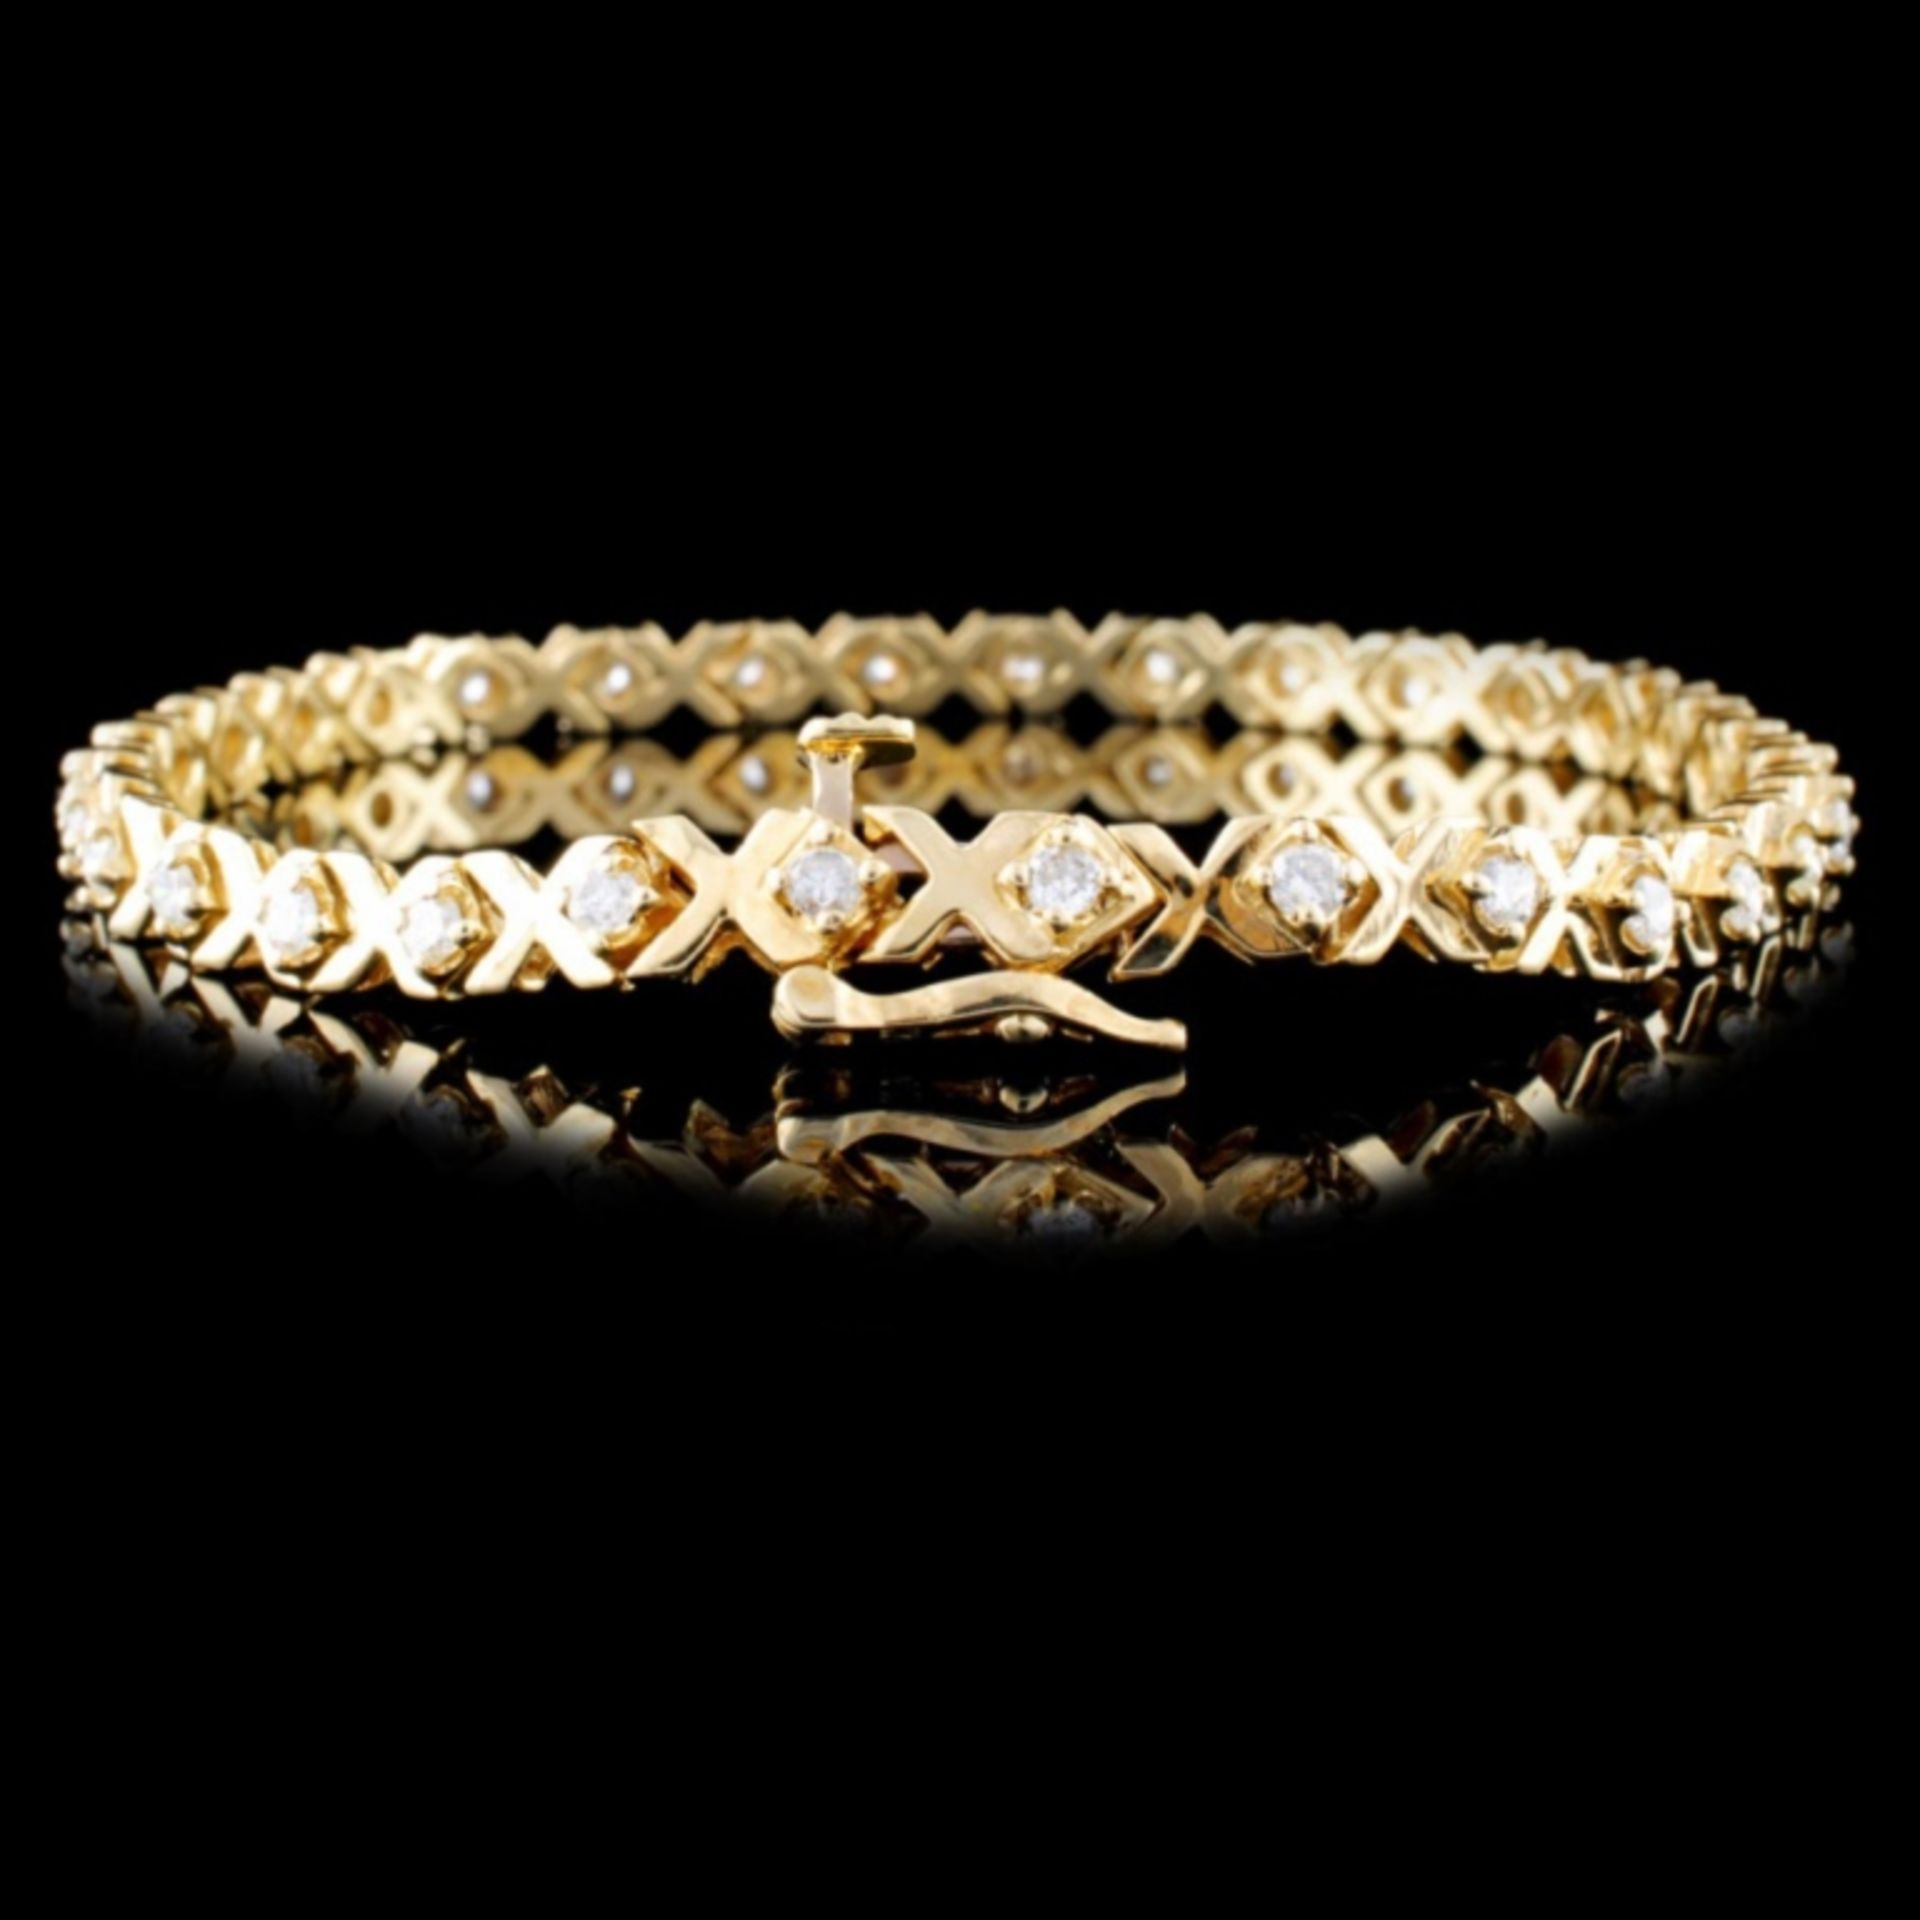 14K Yellow Gold 1.00ct Diamond Bracelet - Image 2 of 3